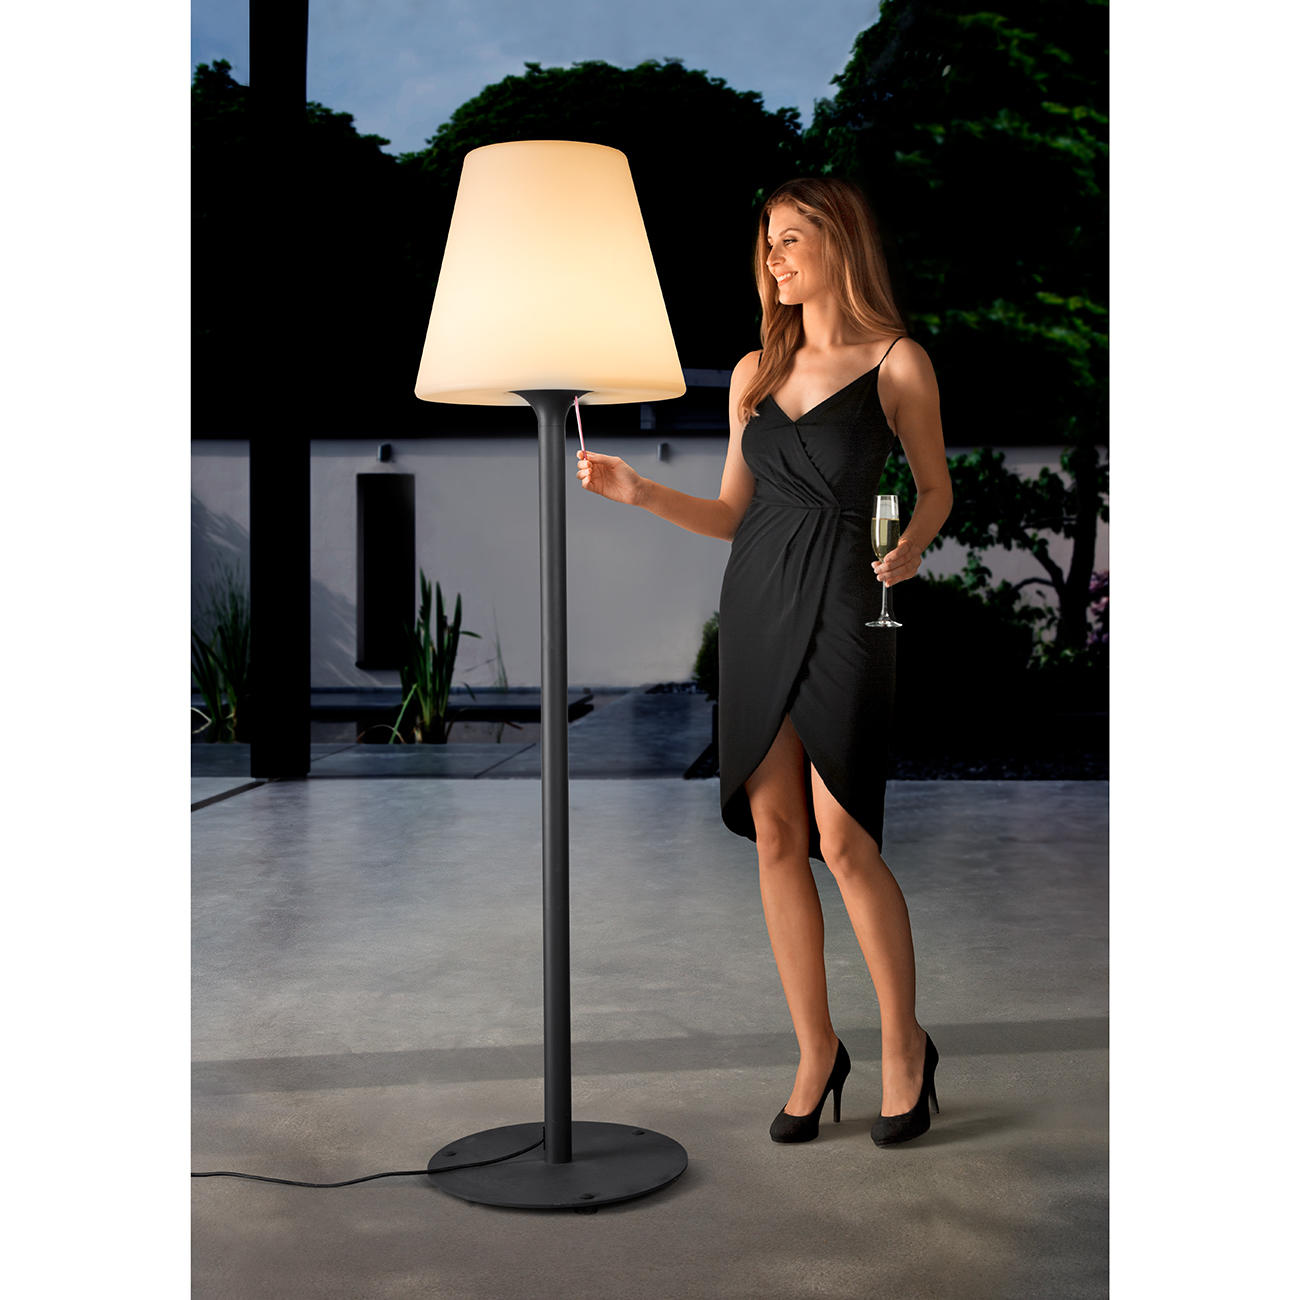 XXL Moonlight Stehlampe